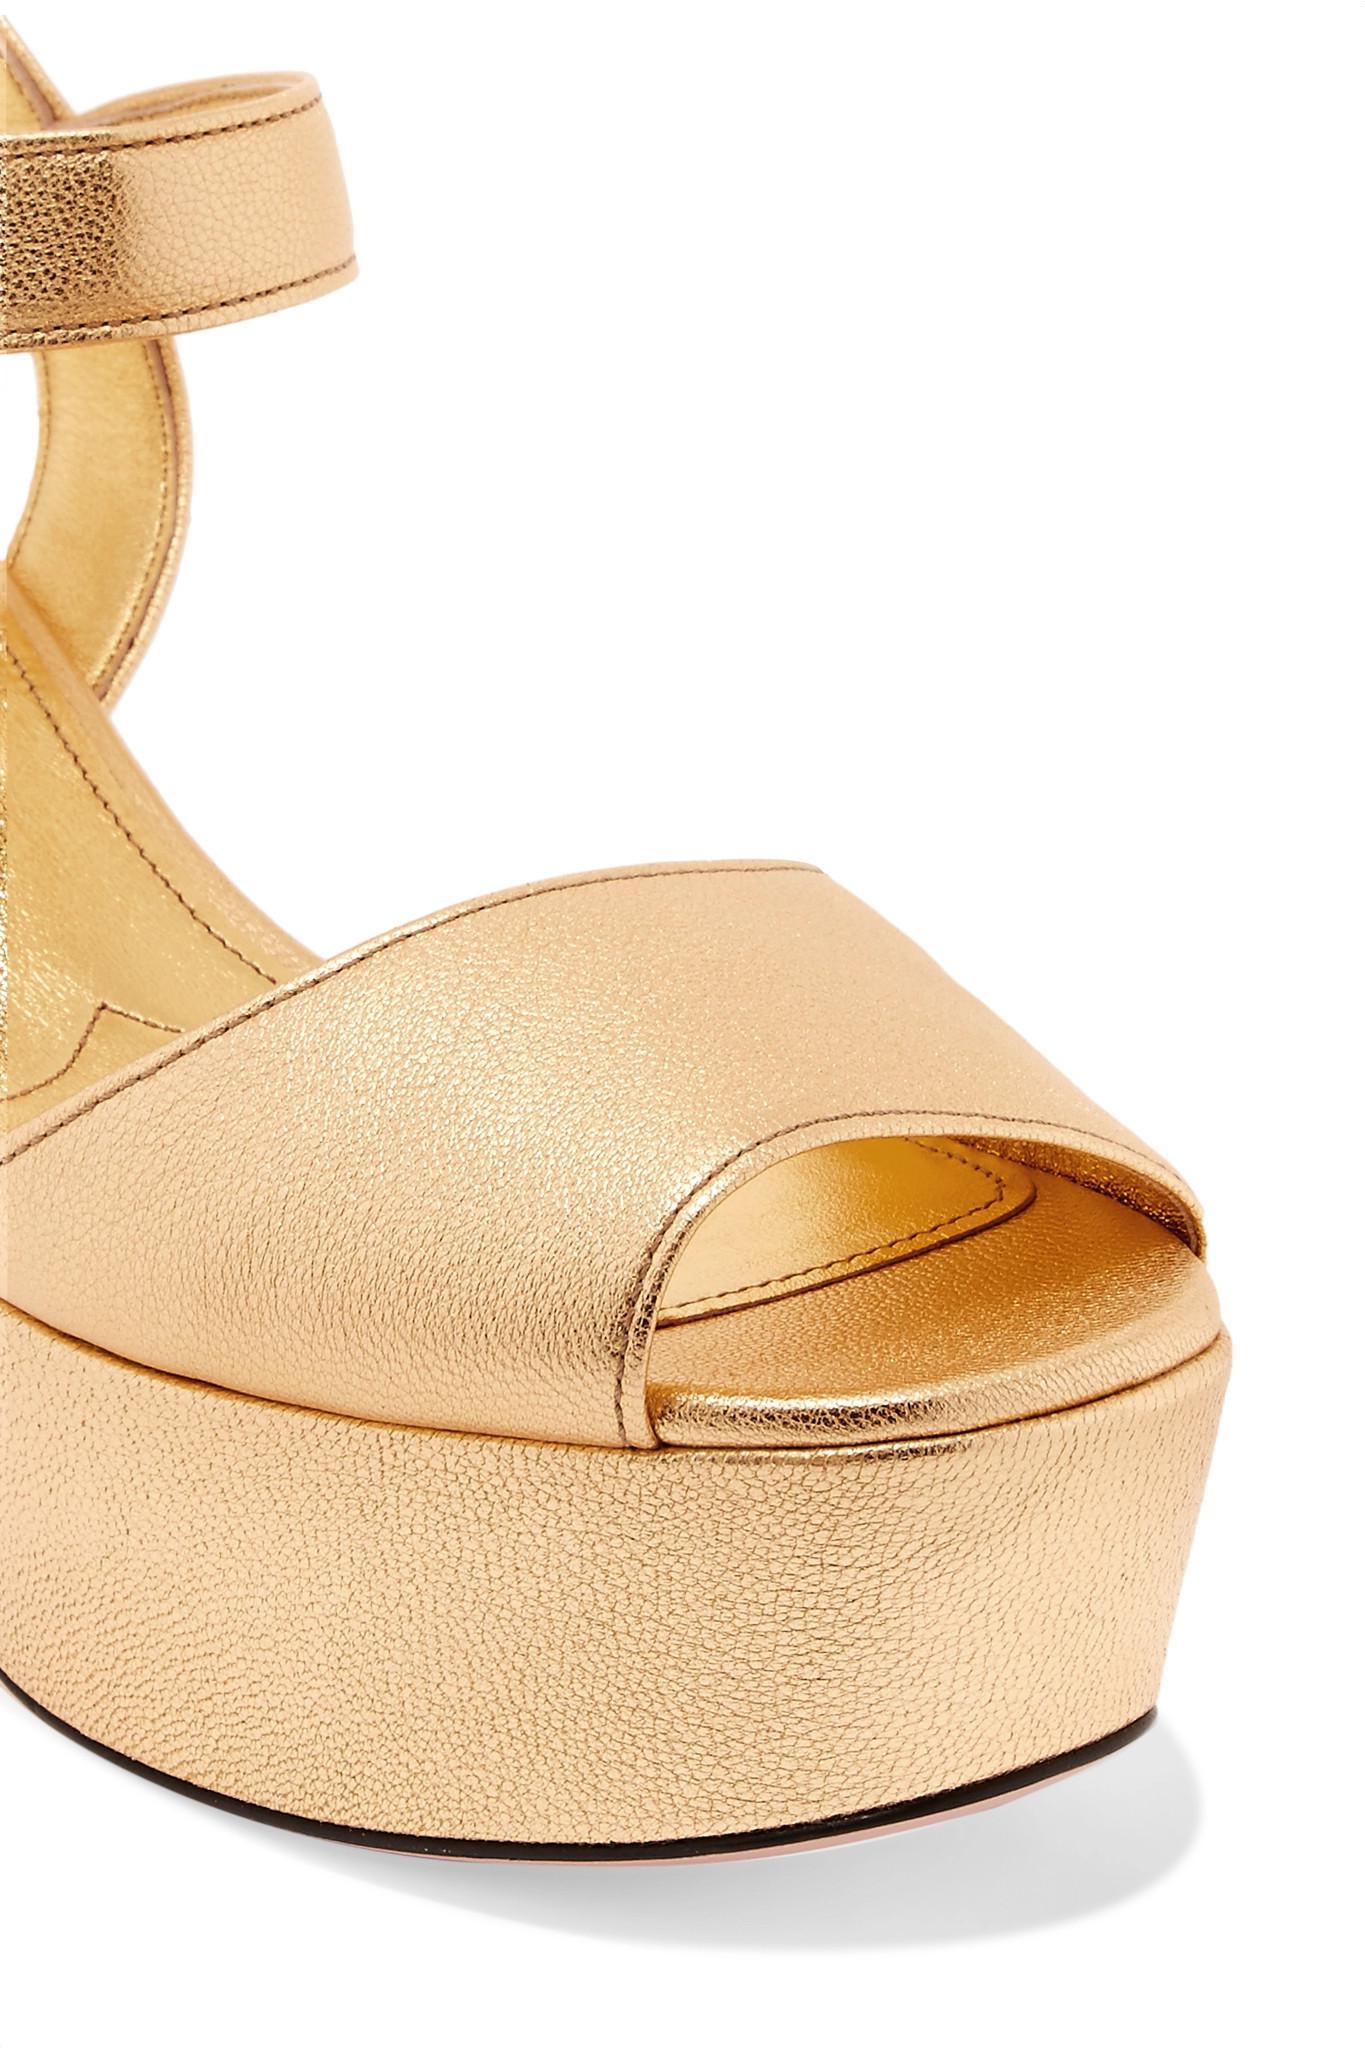 1c3f4e85d29 Prada - Metallic Textured-leather Platform Sandals - Lyst. View fullscreen